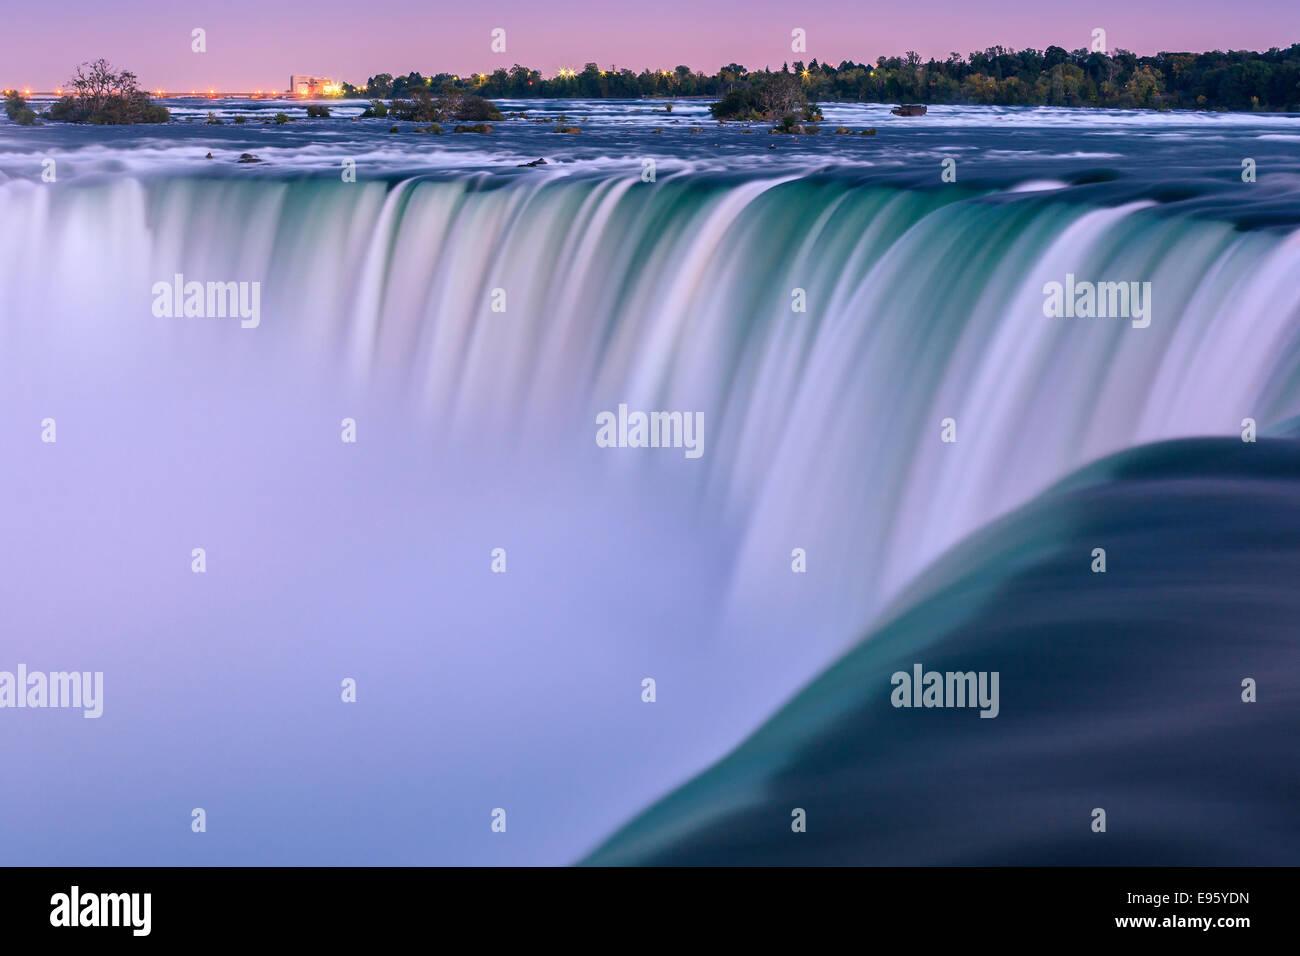 Horseshoe Falls, une partie de la région de Niagara Falls, Ontario, Canada. Photo Stock